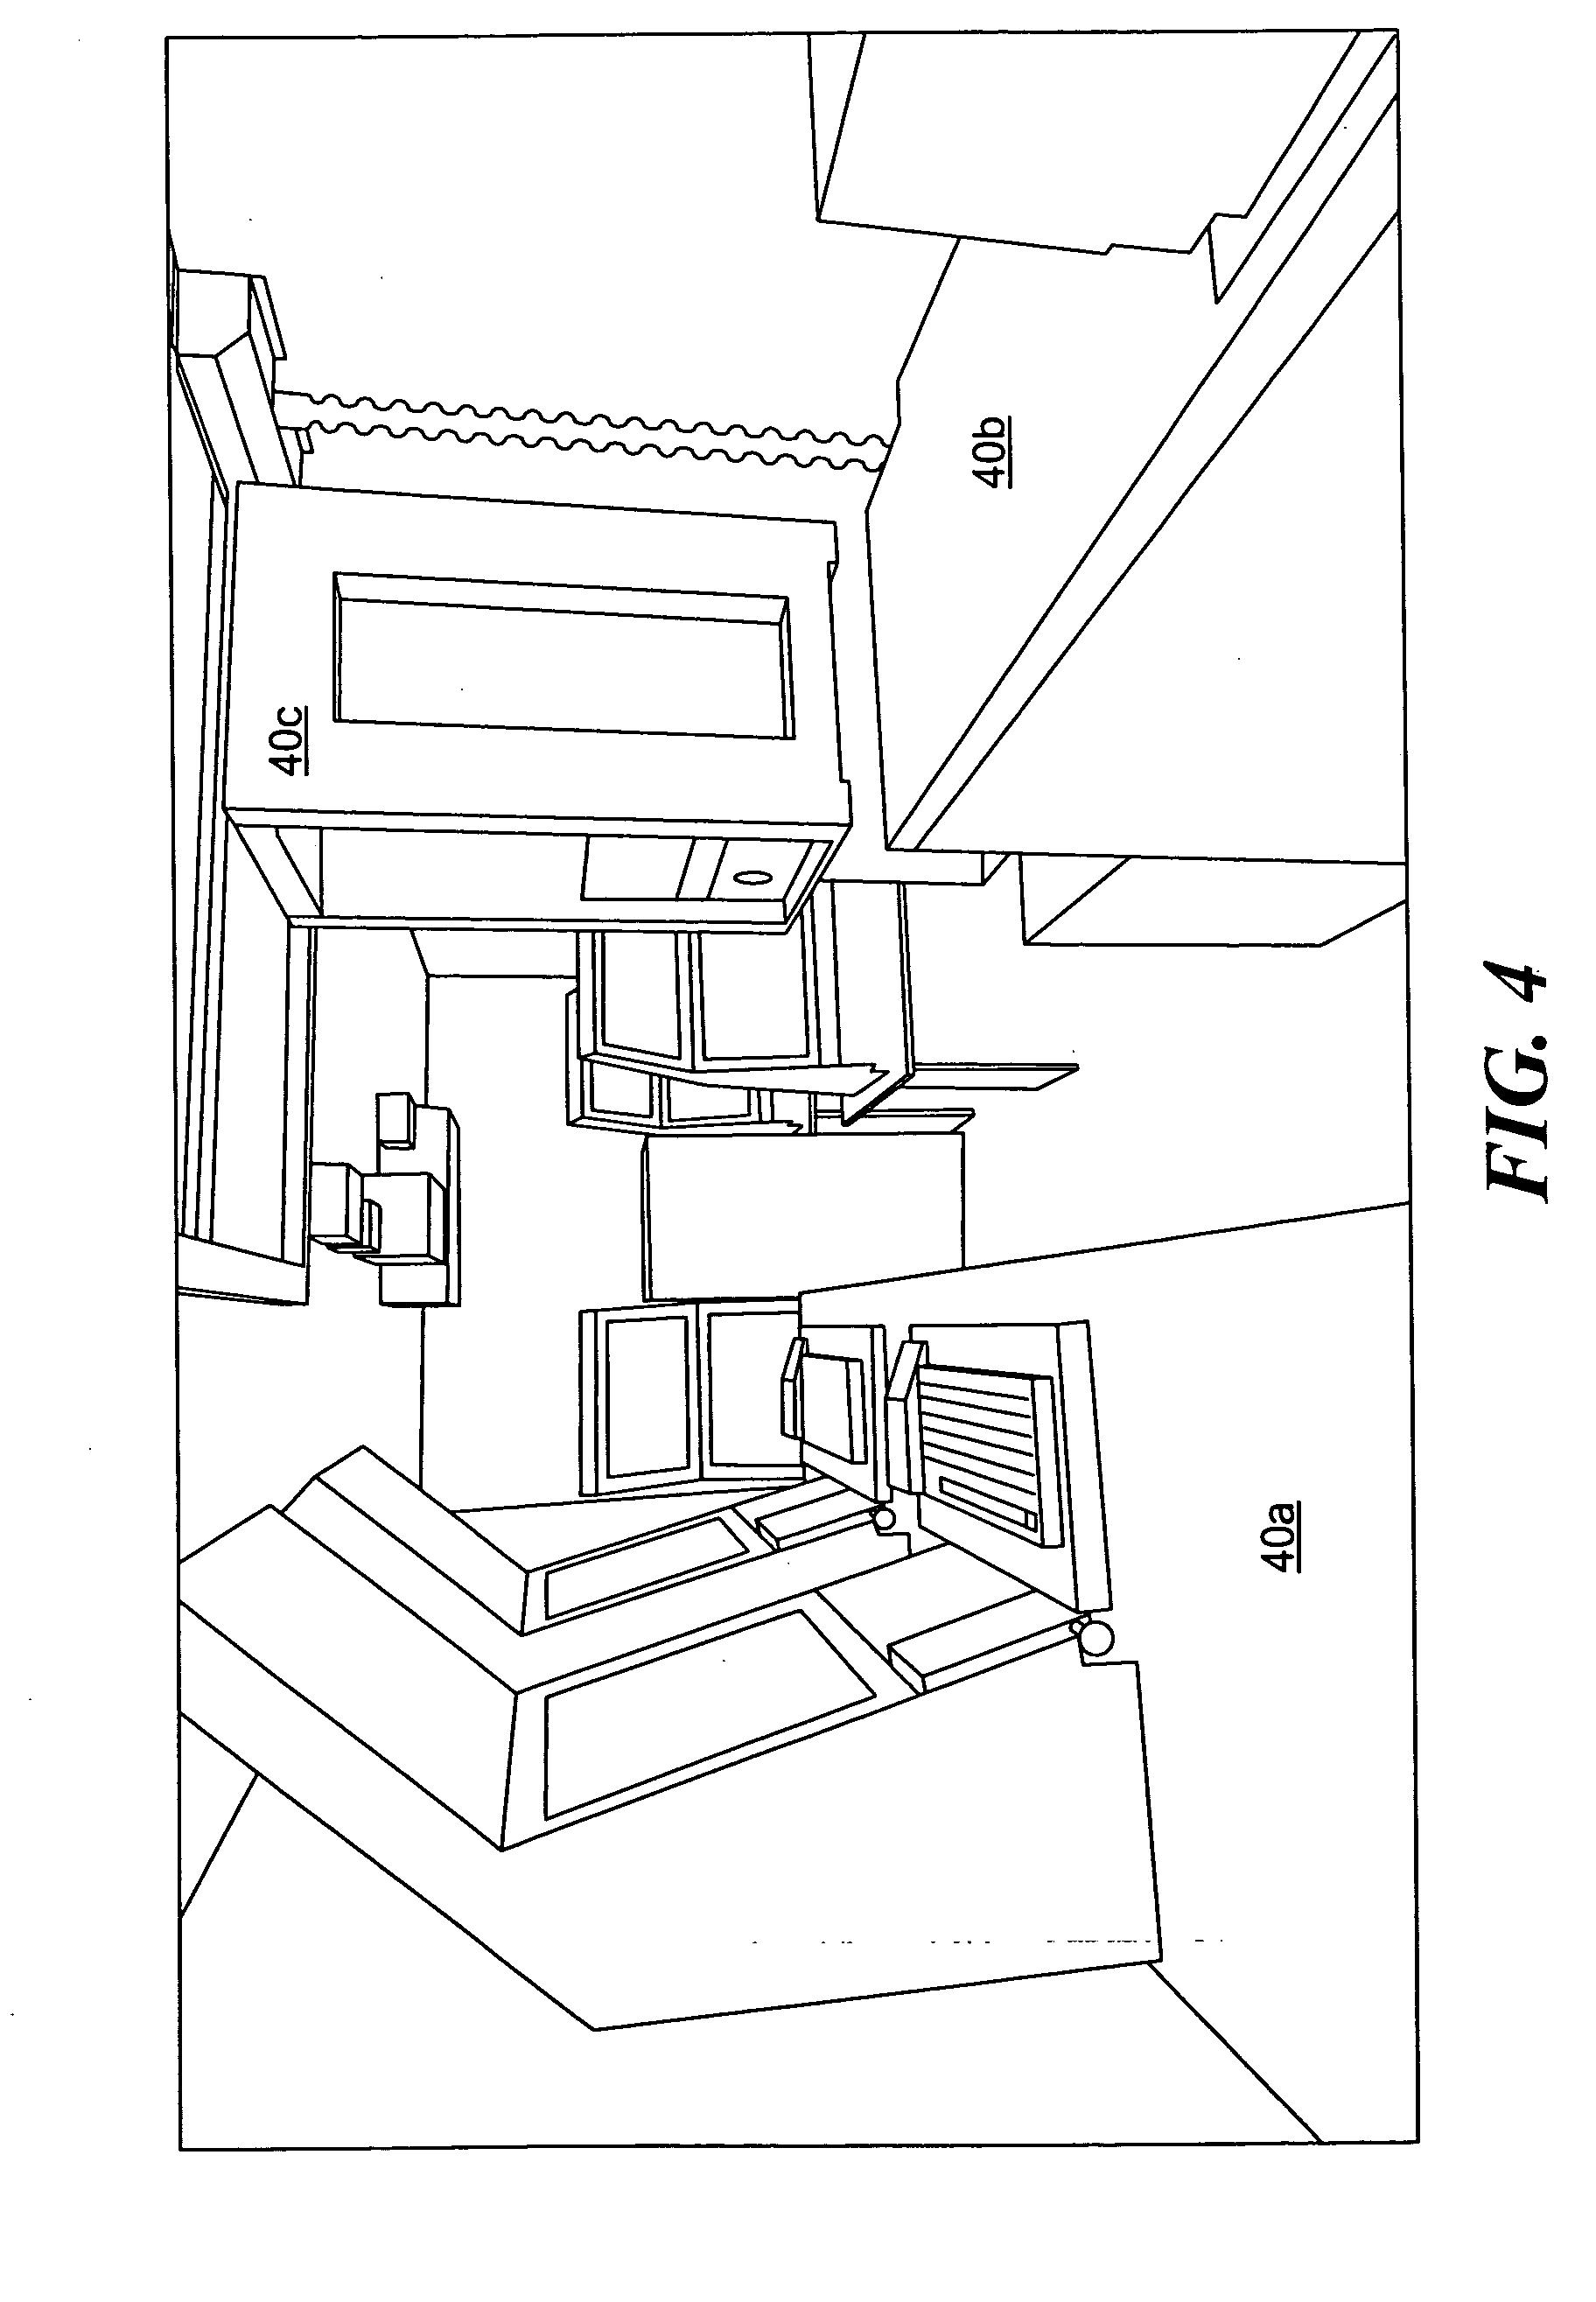 patent us20090321371 - modular rack system